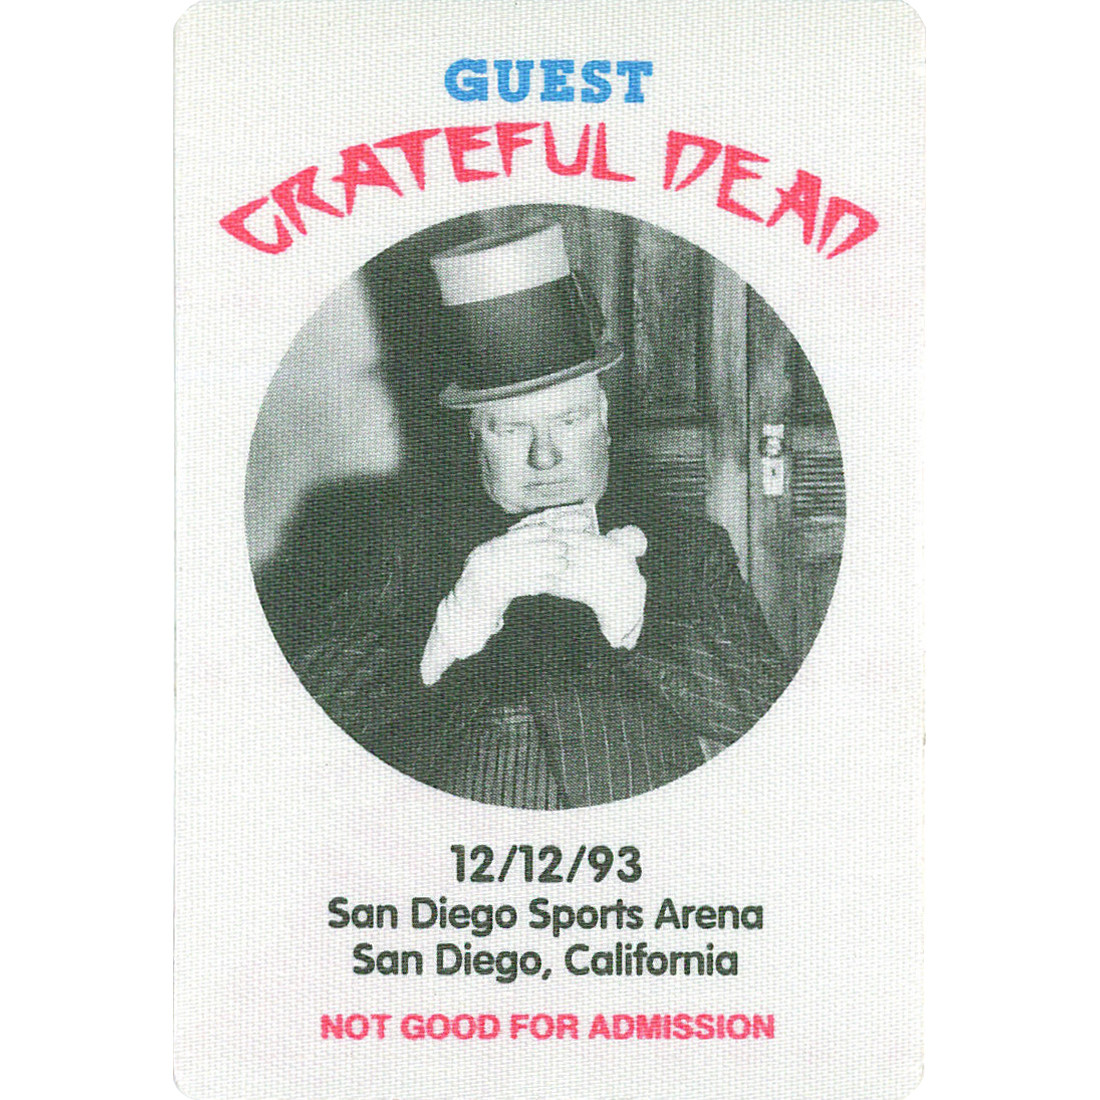 Grateful Dead 1993 12-12 Backstage Pass